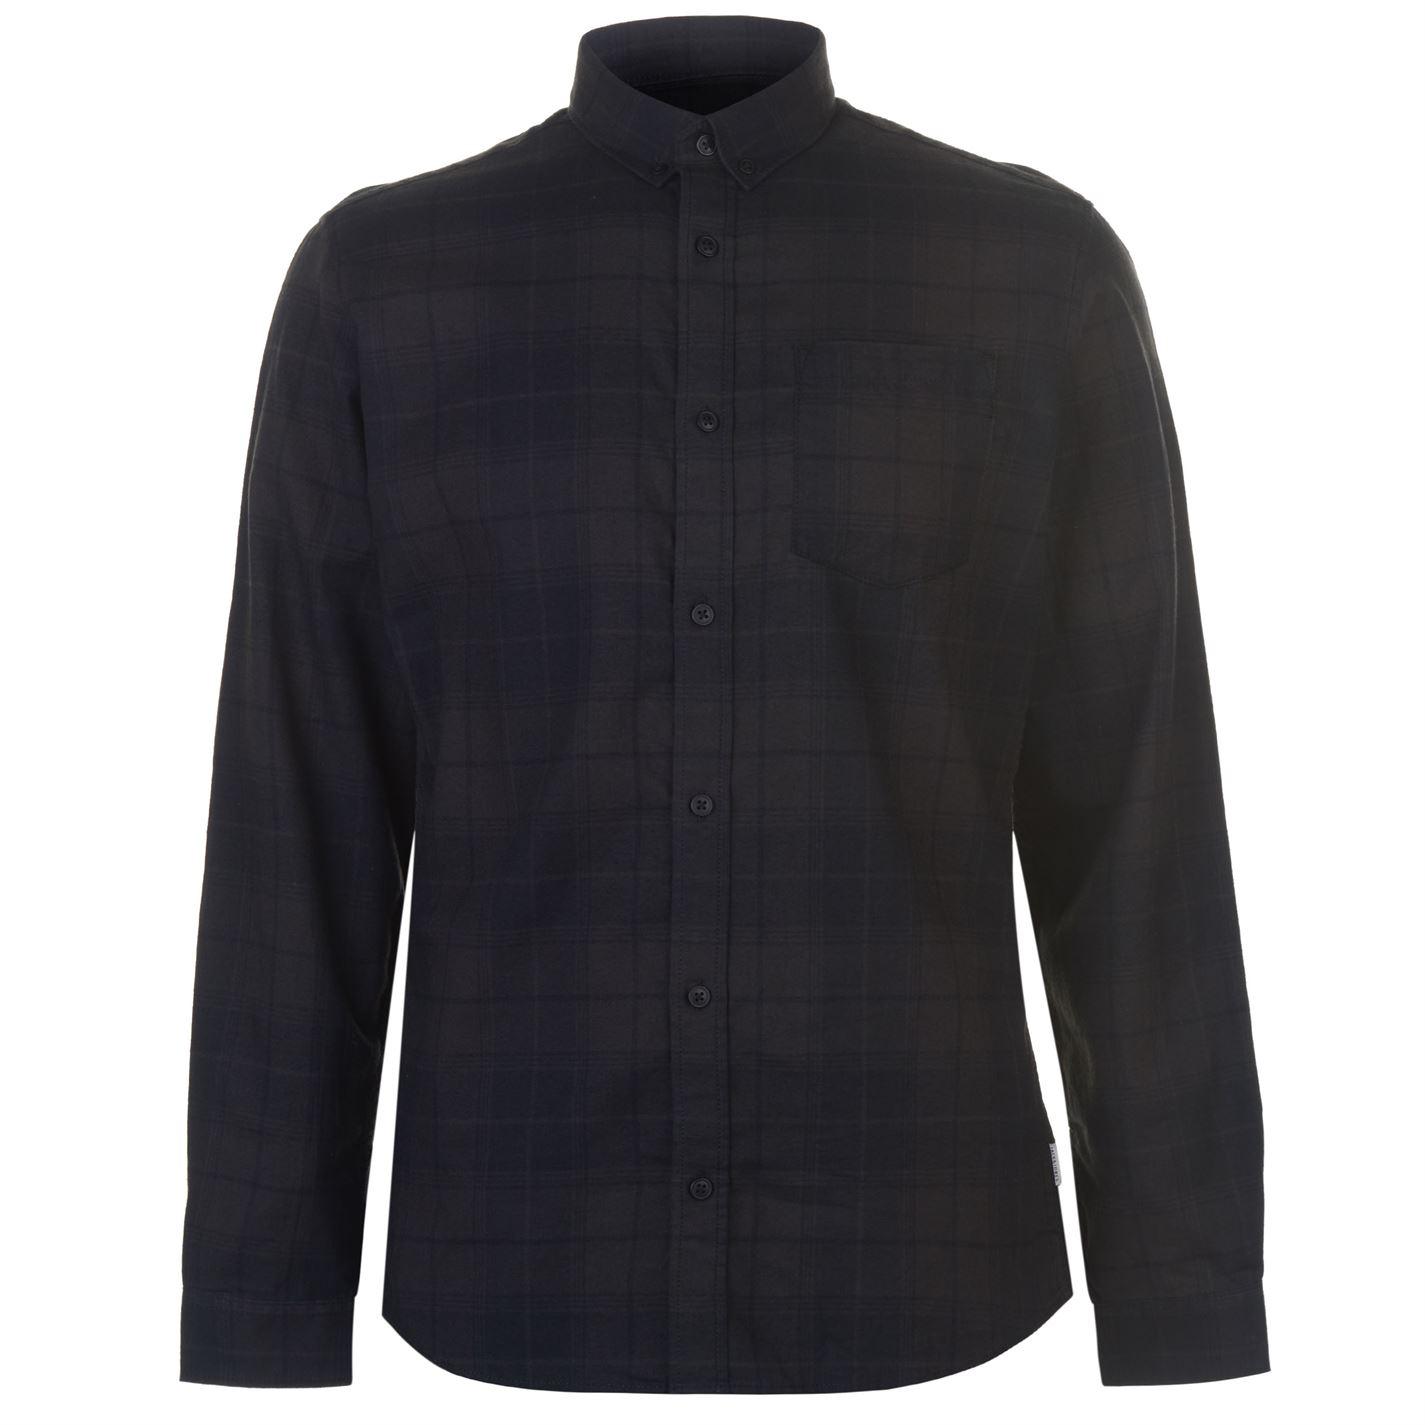 Jack and Jones Core Odlin Long Sleeve Shirt